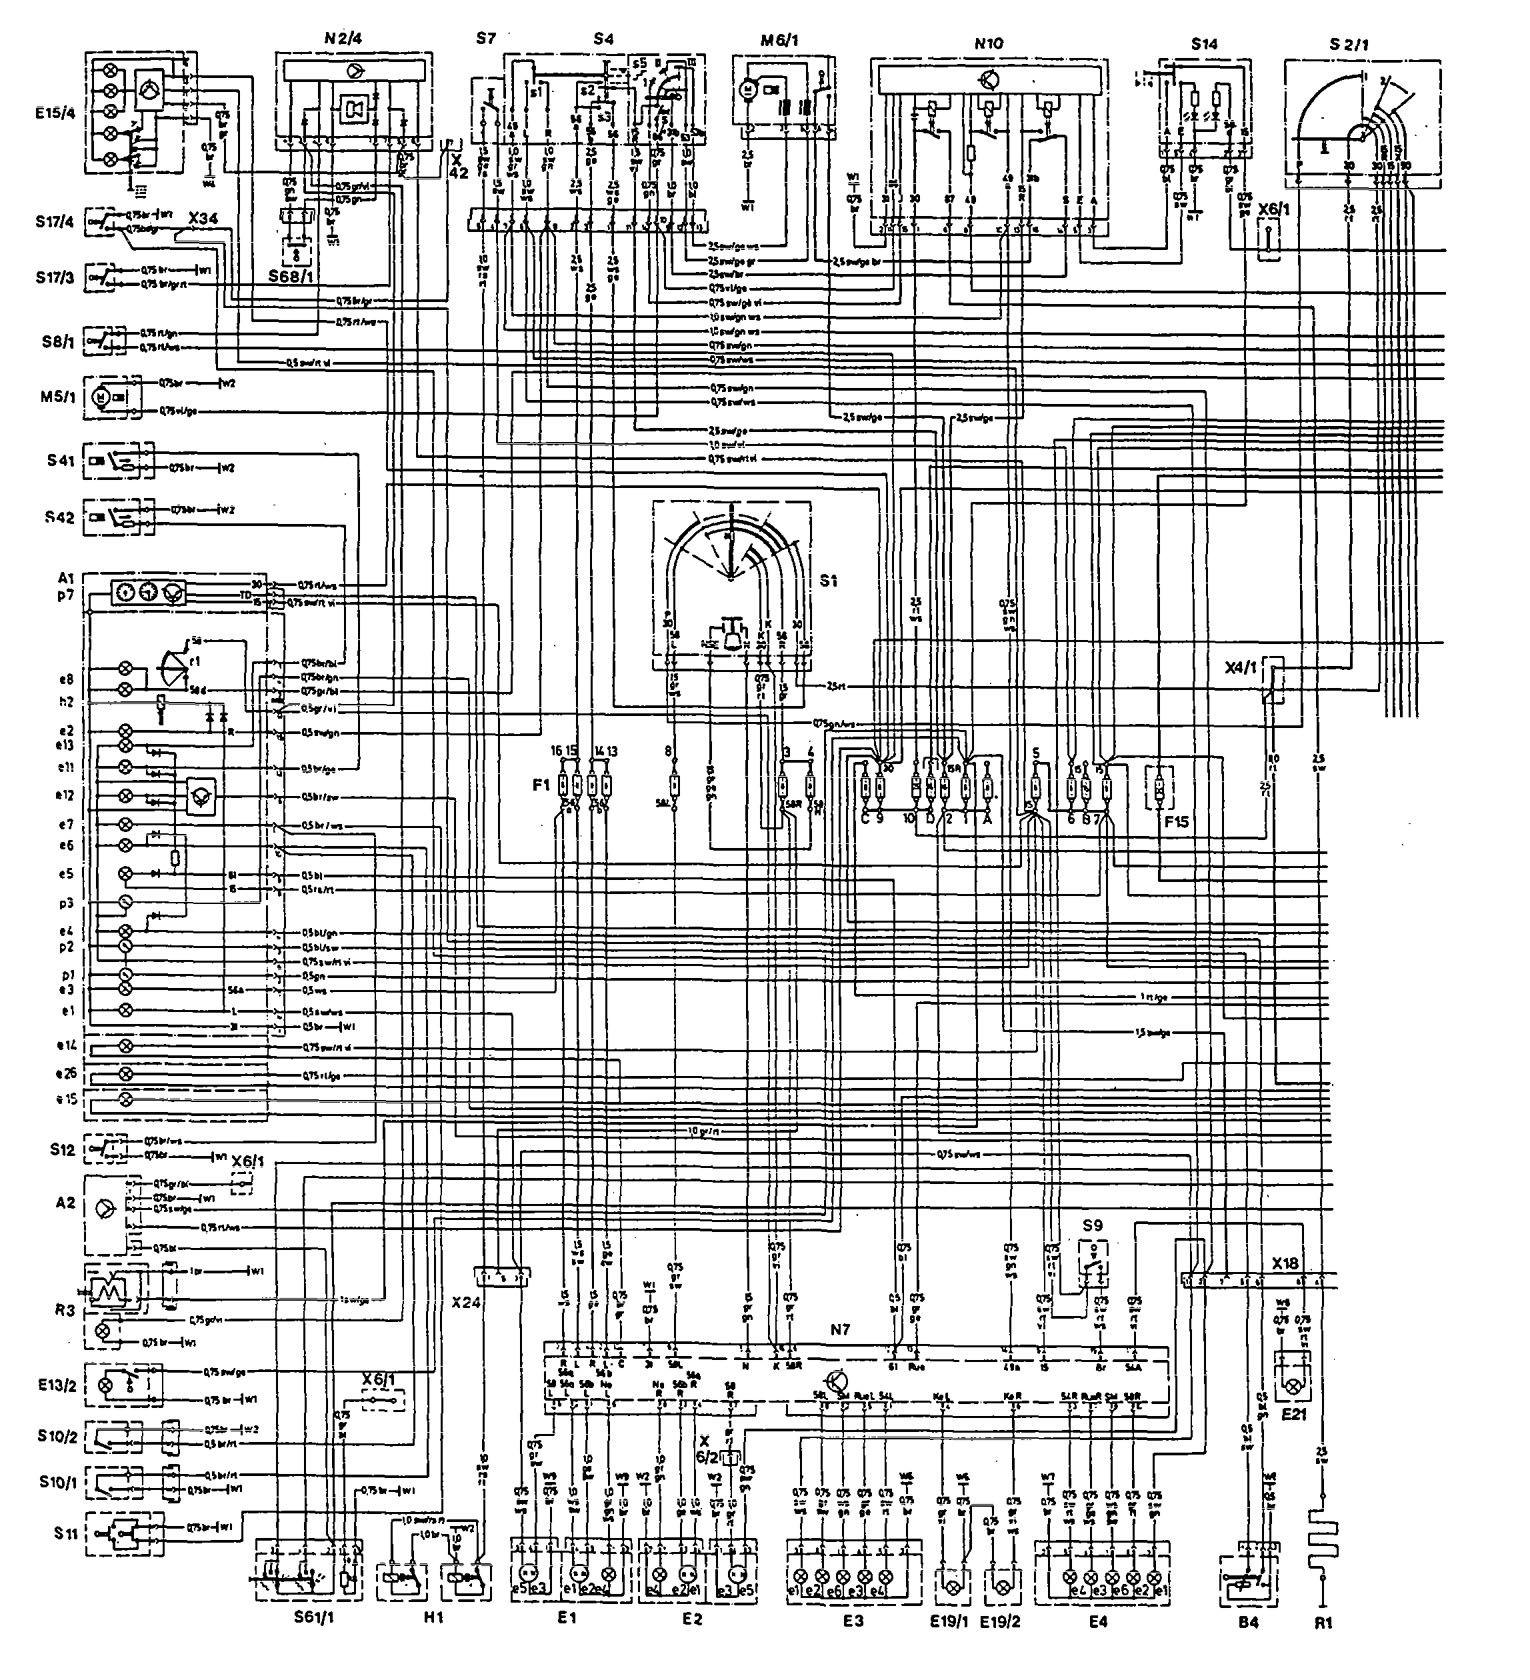 hight resolution of mercedes benz w124 200 200e 230e 260e 300e owners manual